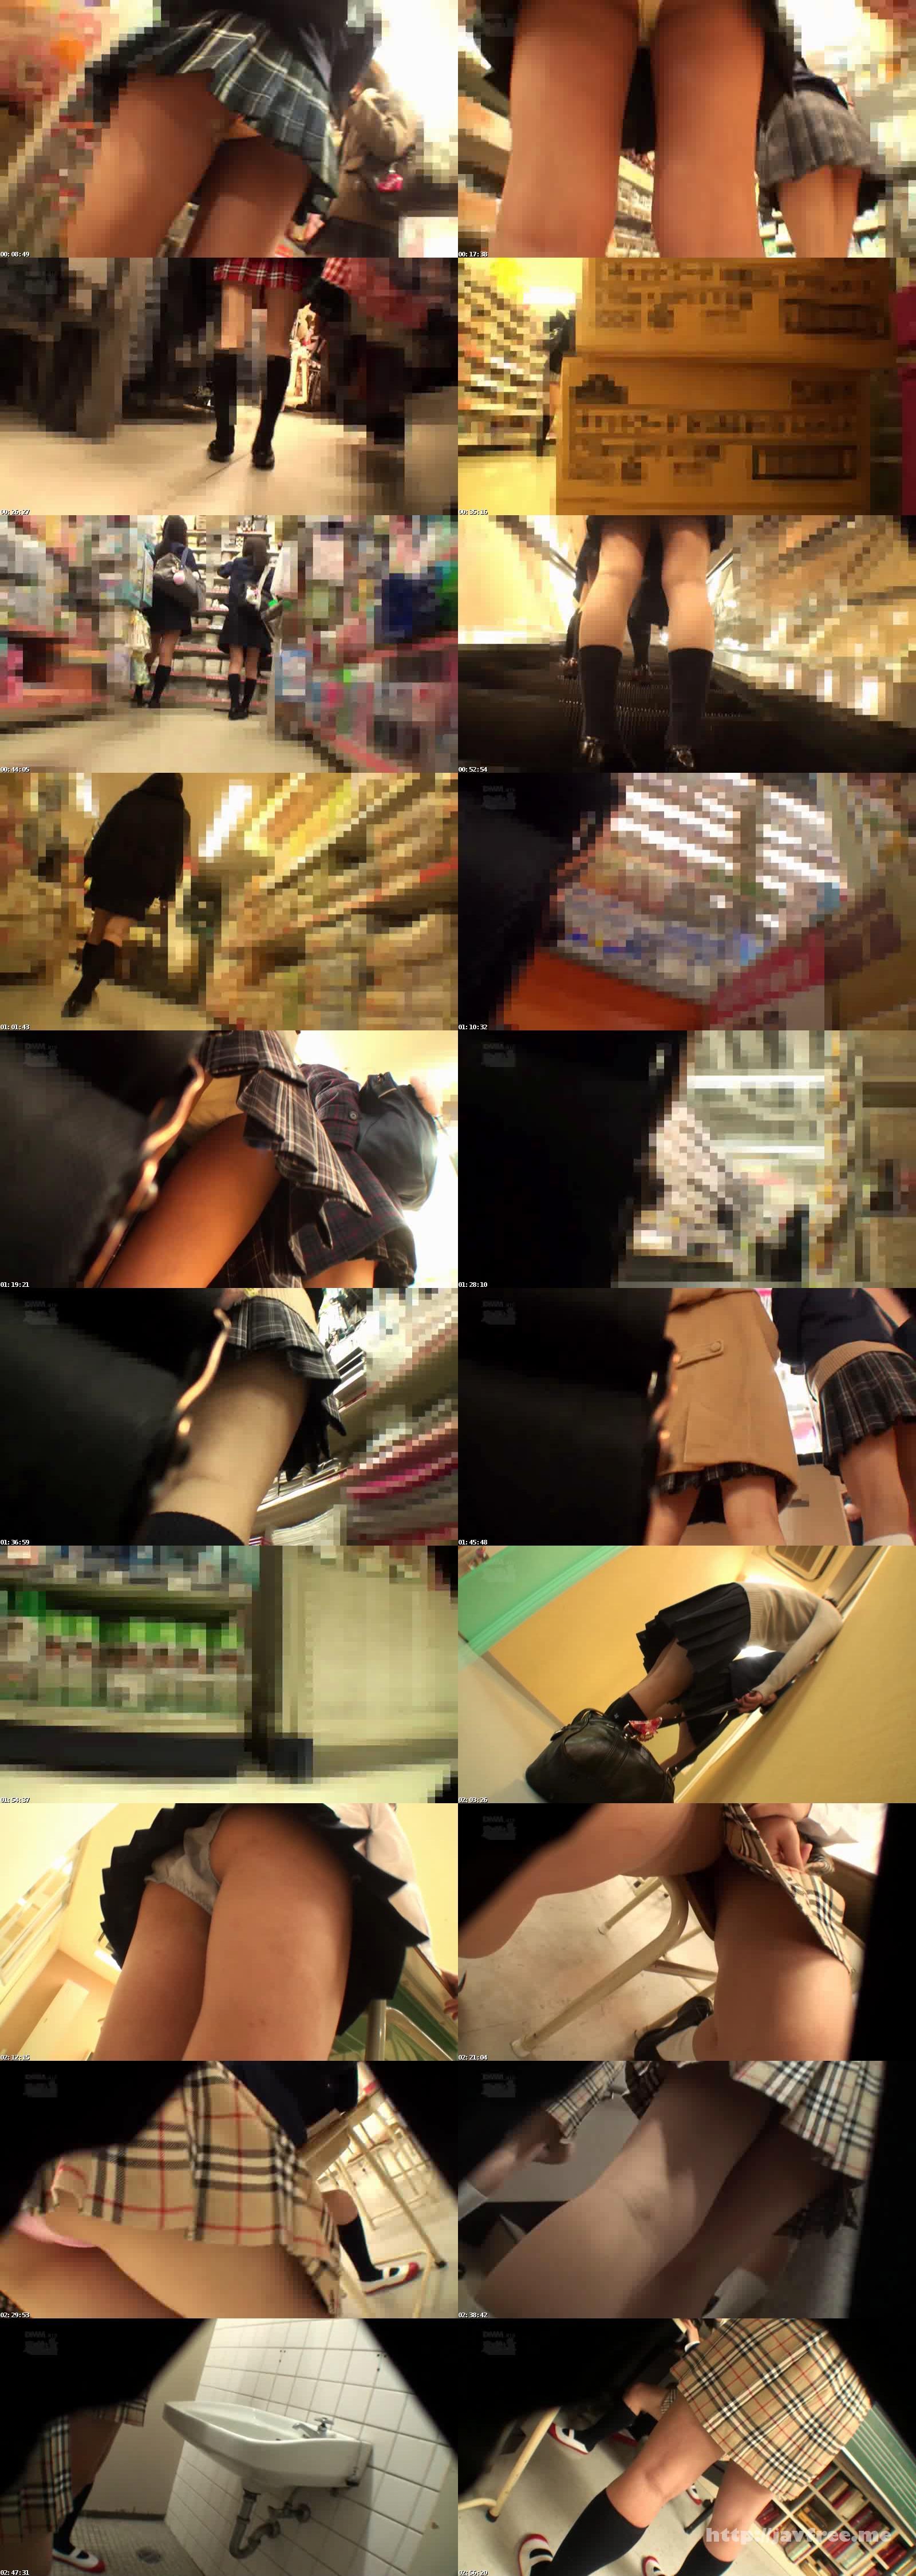 [CLUB-171] 1920×1080 Full HD Premium街エロ盗撮東京パンチラ捜査線 Blu-ray (ブルーレイディスク) - image CLUB-171 on https://javfree.me